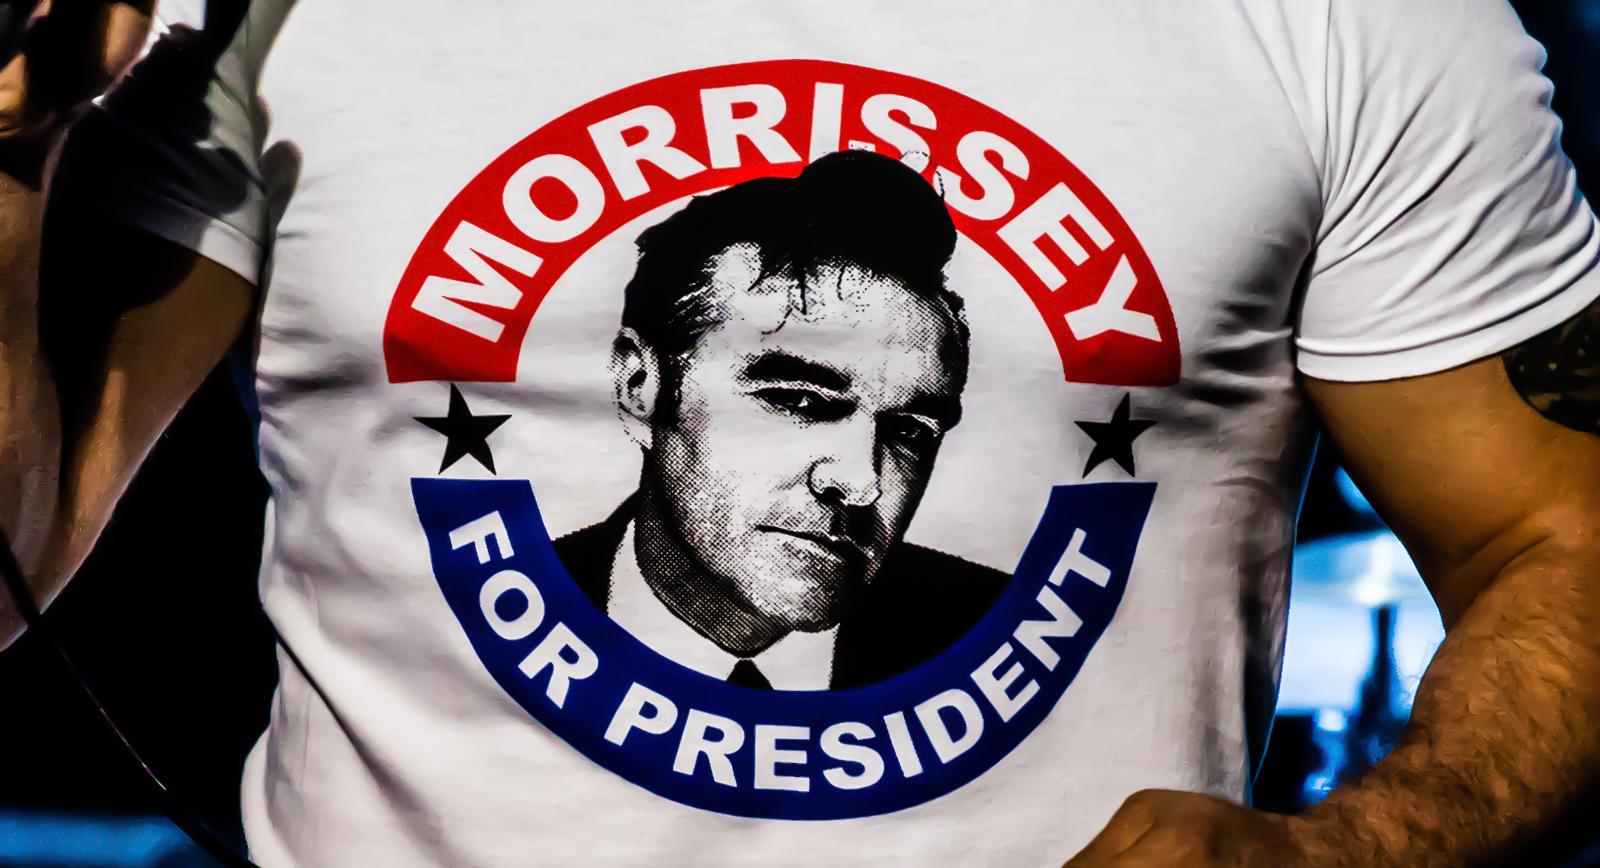 Morrissey-Concert-Review-Photos-2015-Tour-Masonic-San-Francisco-FI